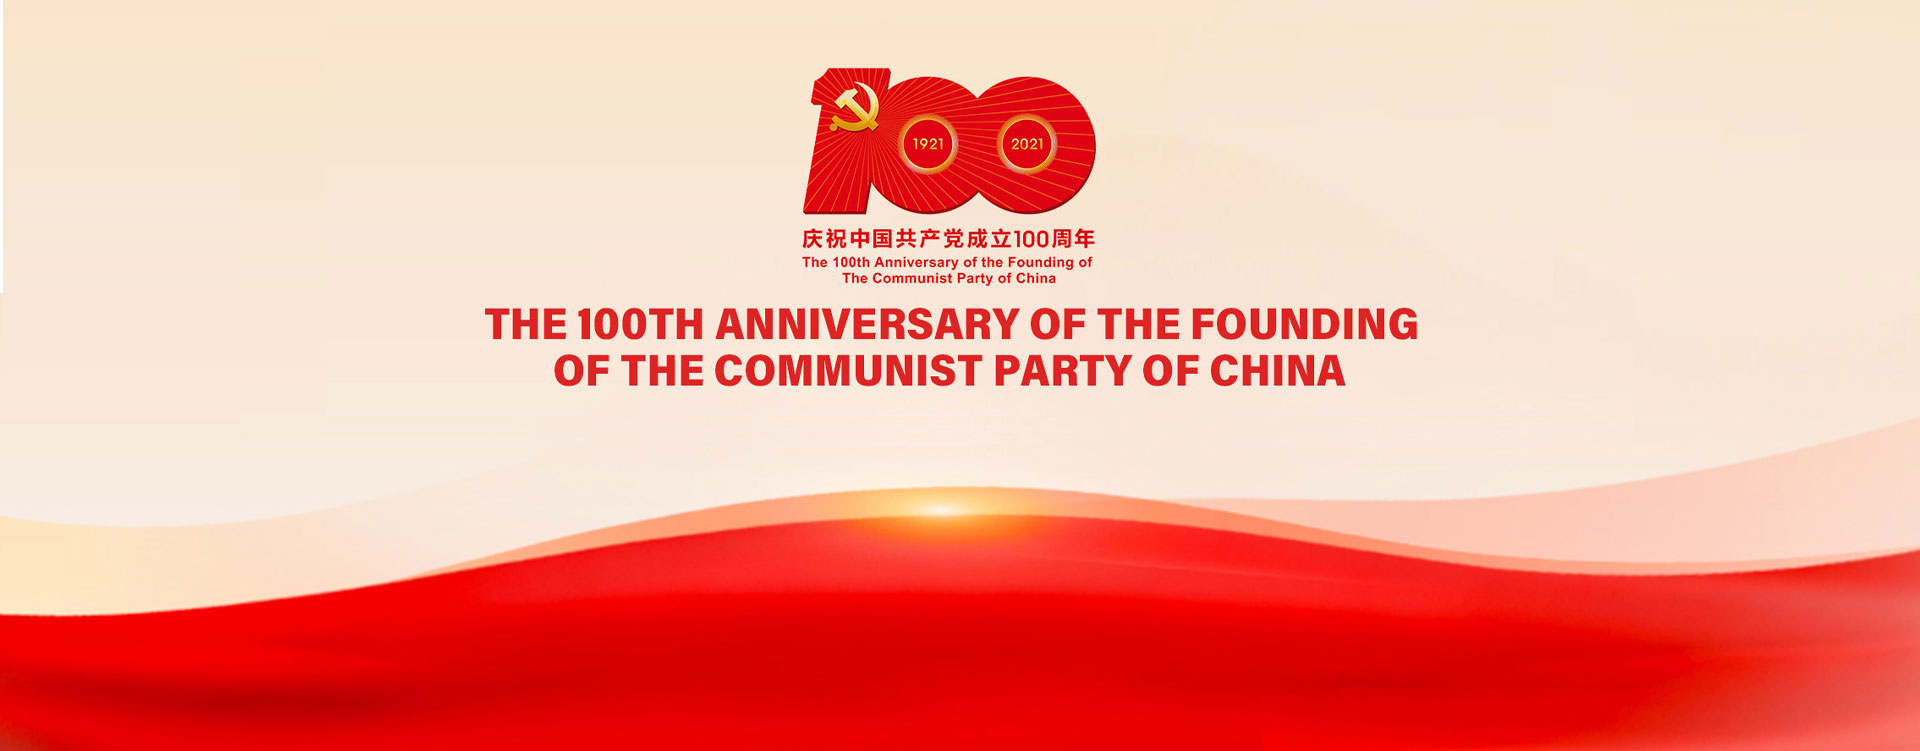 Guangzhou lights up in celebration of CPC's centenary